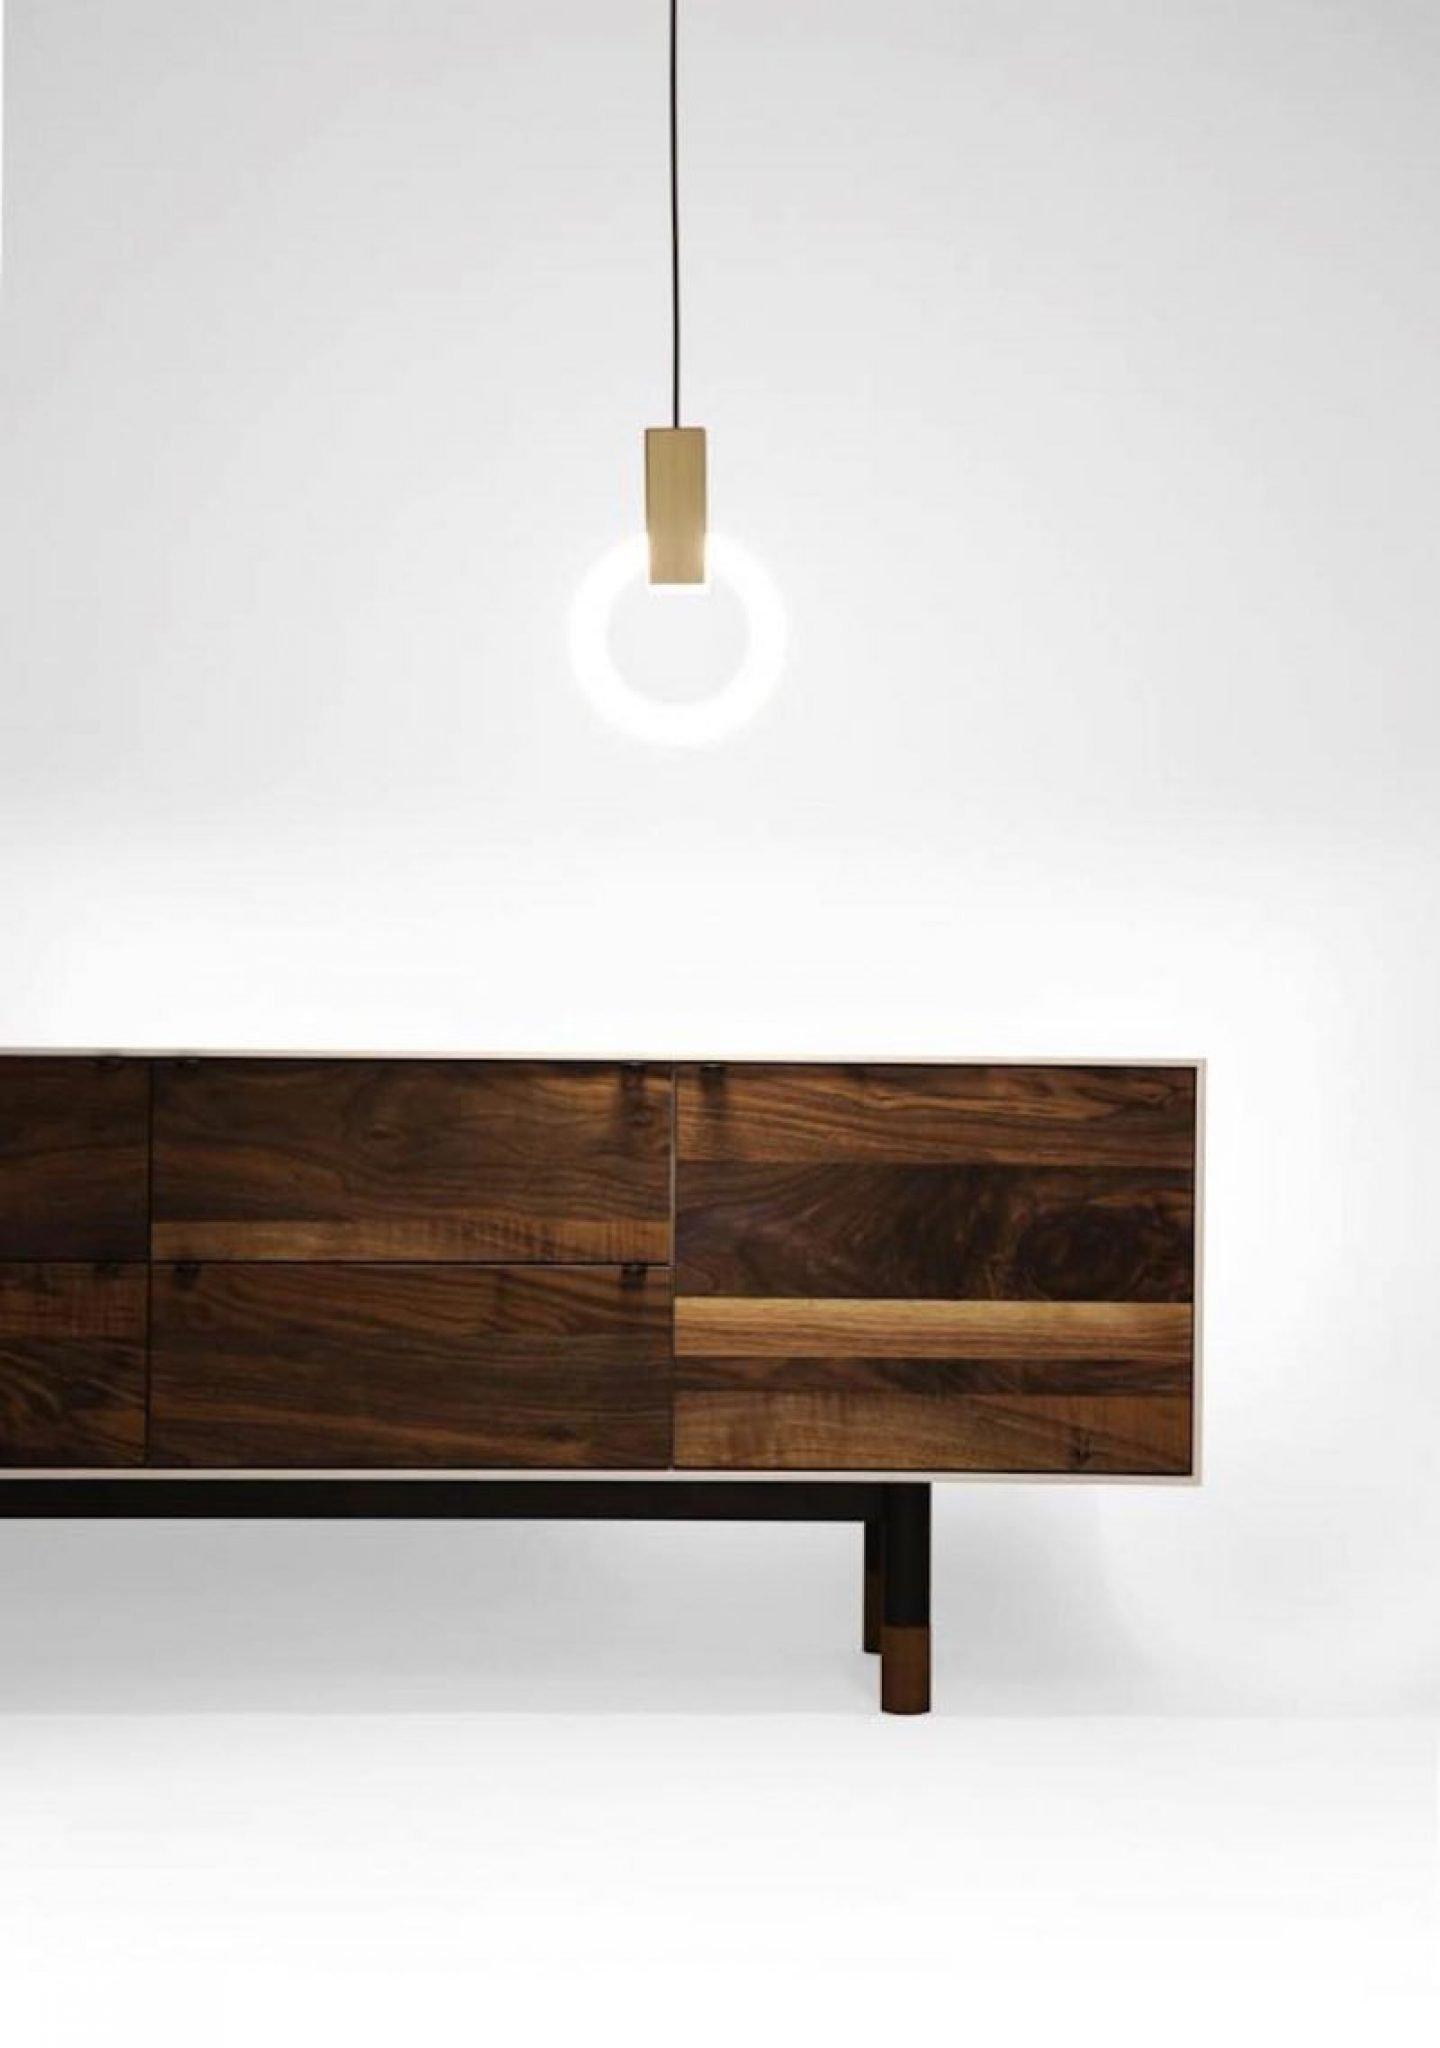 Design_Halo_Lamp_Matthew_McCormick_Studio_13